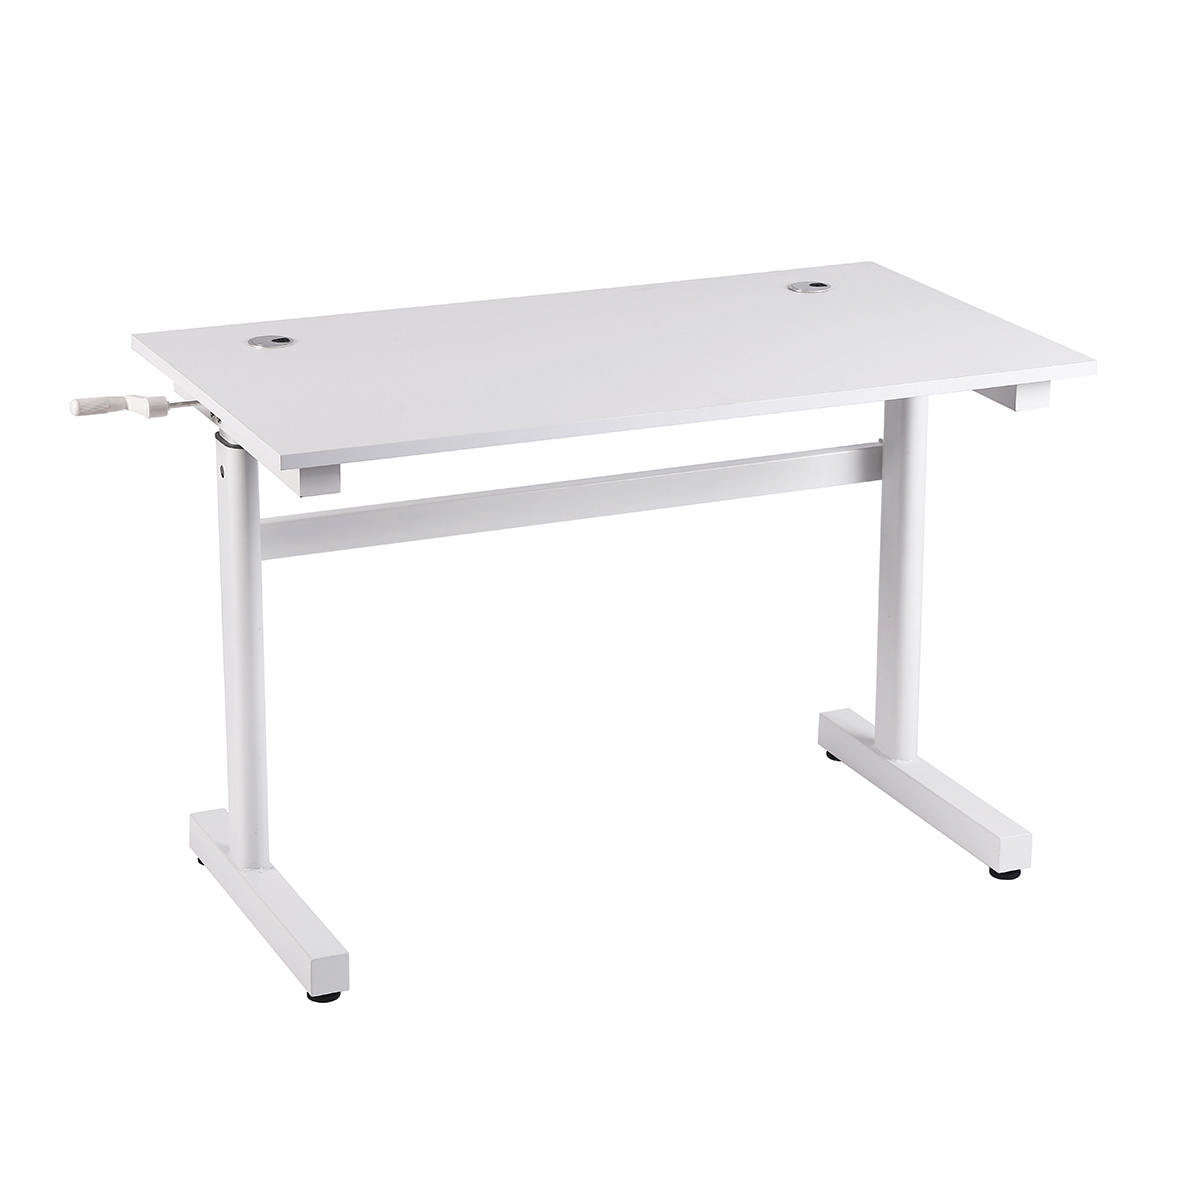 FS-OD42C-WH White Desk